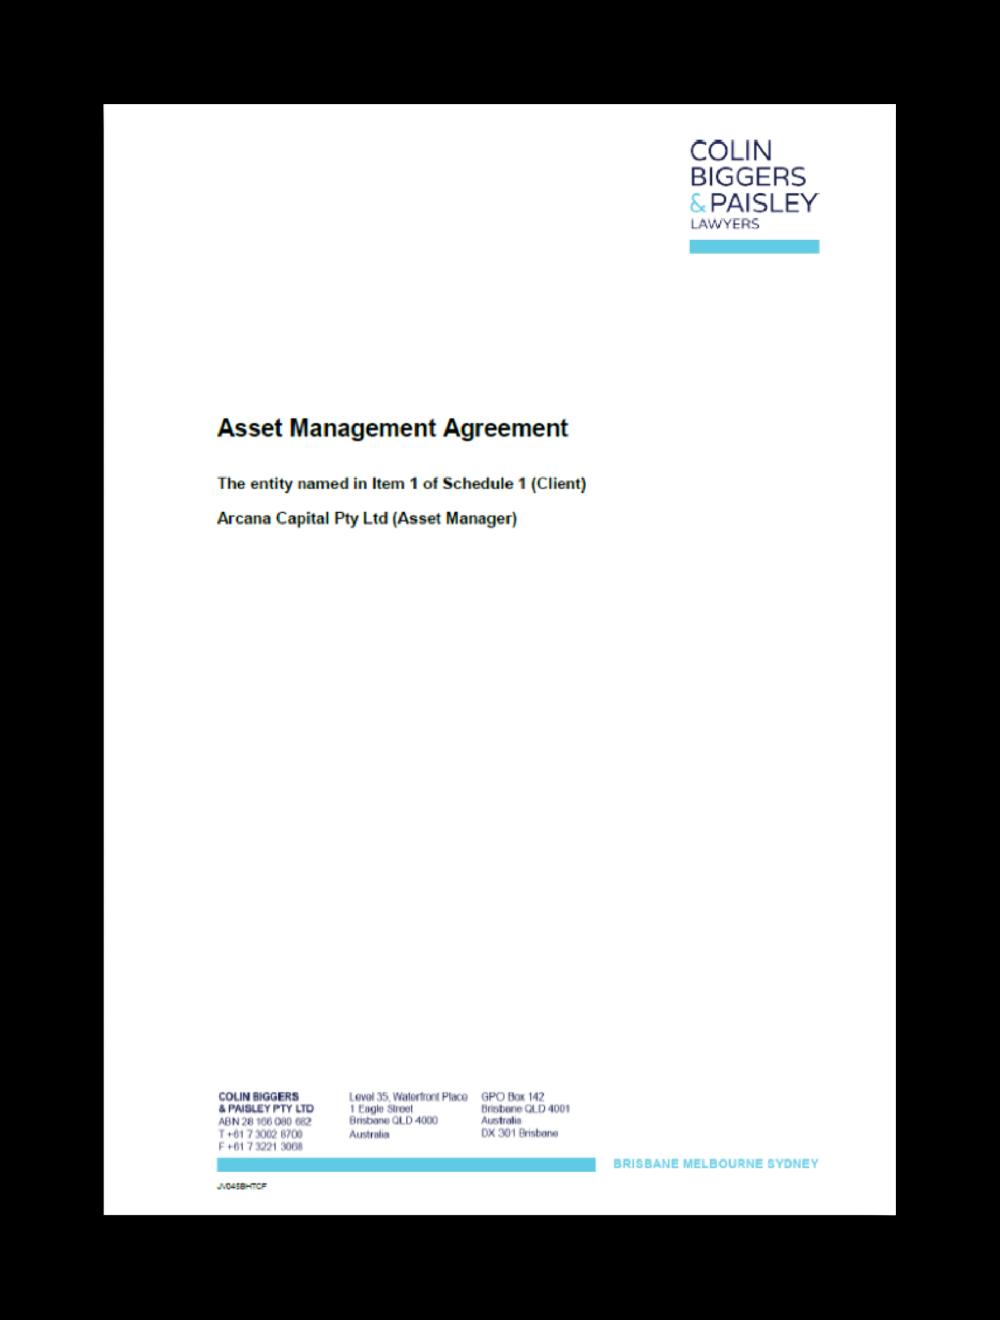 Asset Management Agreement (AMA)